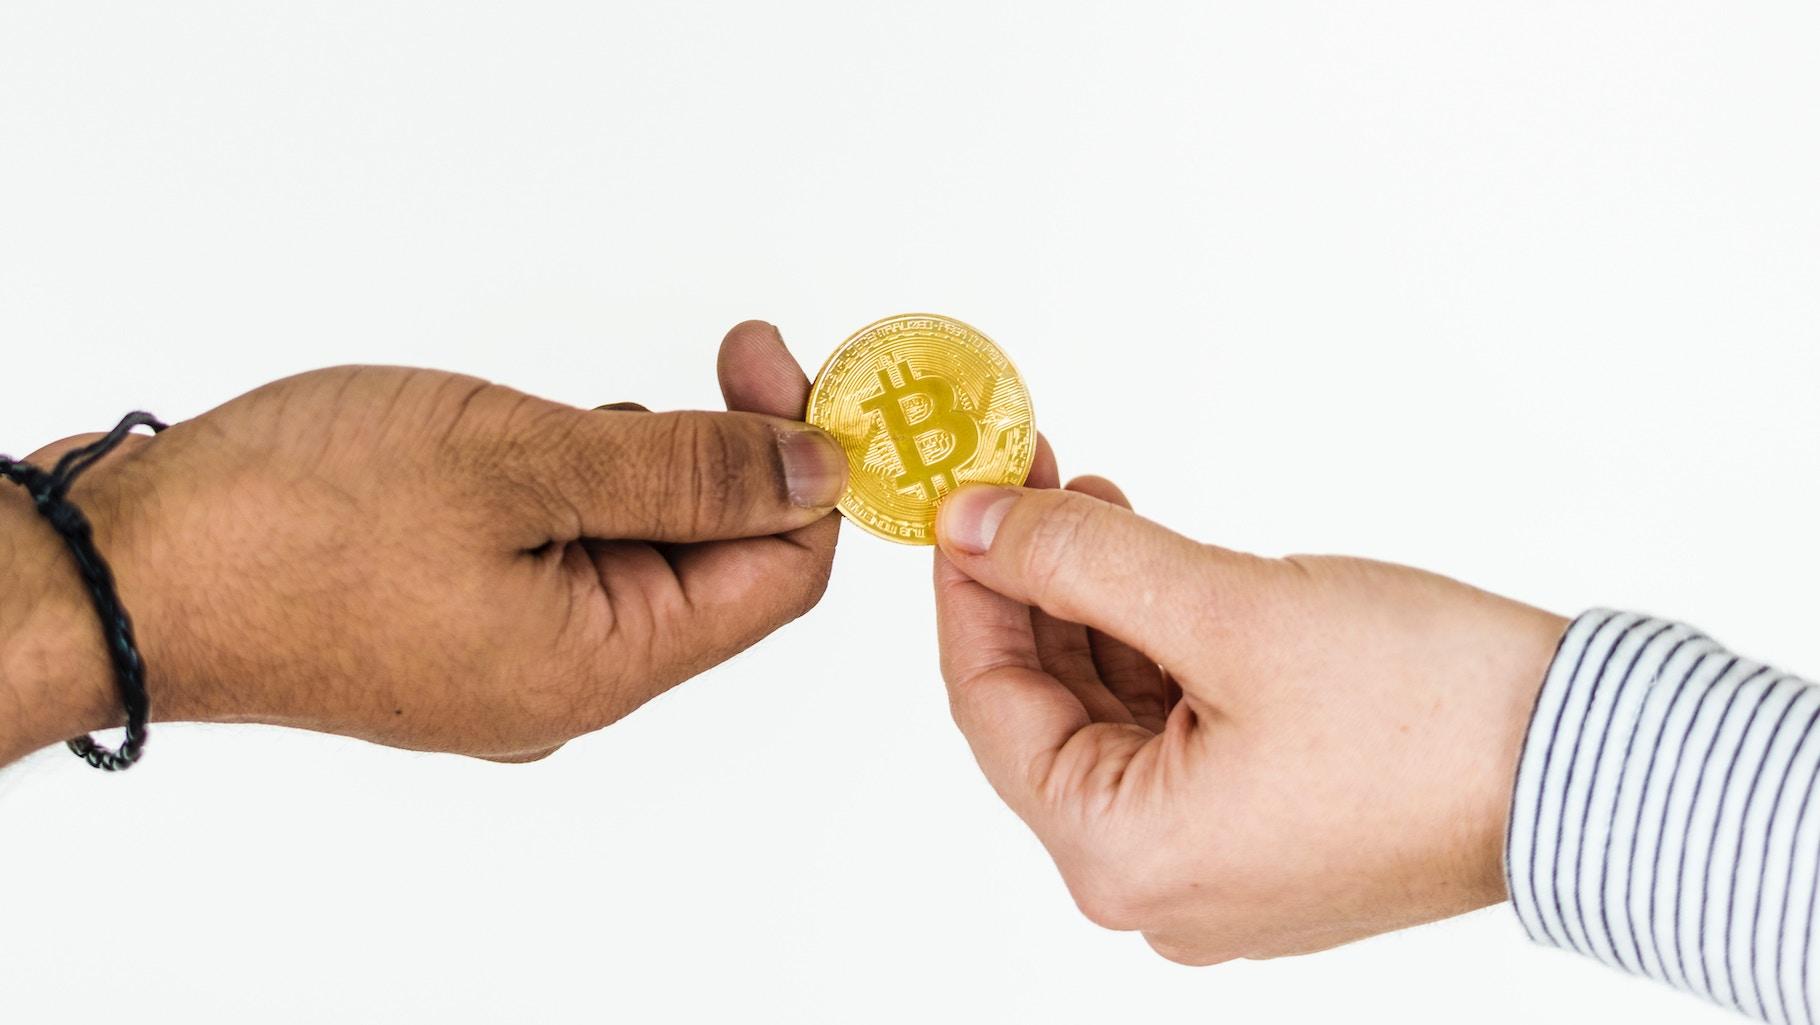 Post cryptum: Škola dlja blockchain-rozrobnykiv, migracija majneriv ta efir za prybyrannja